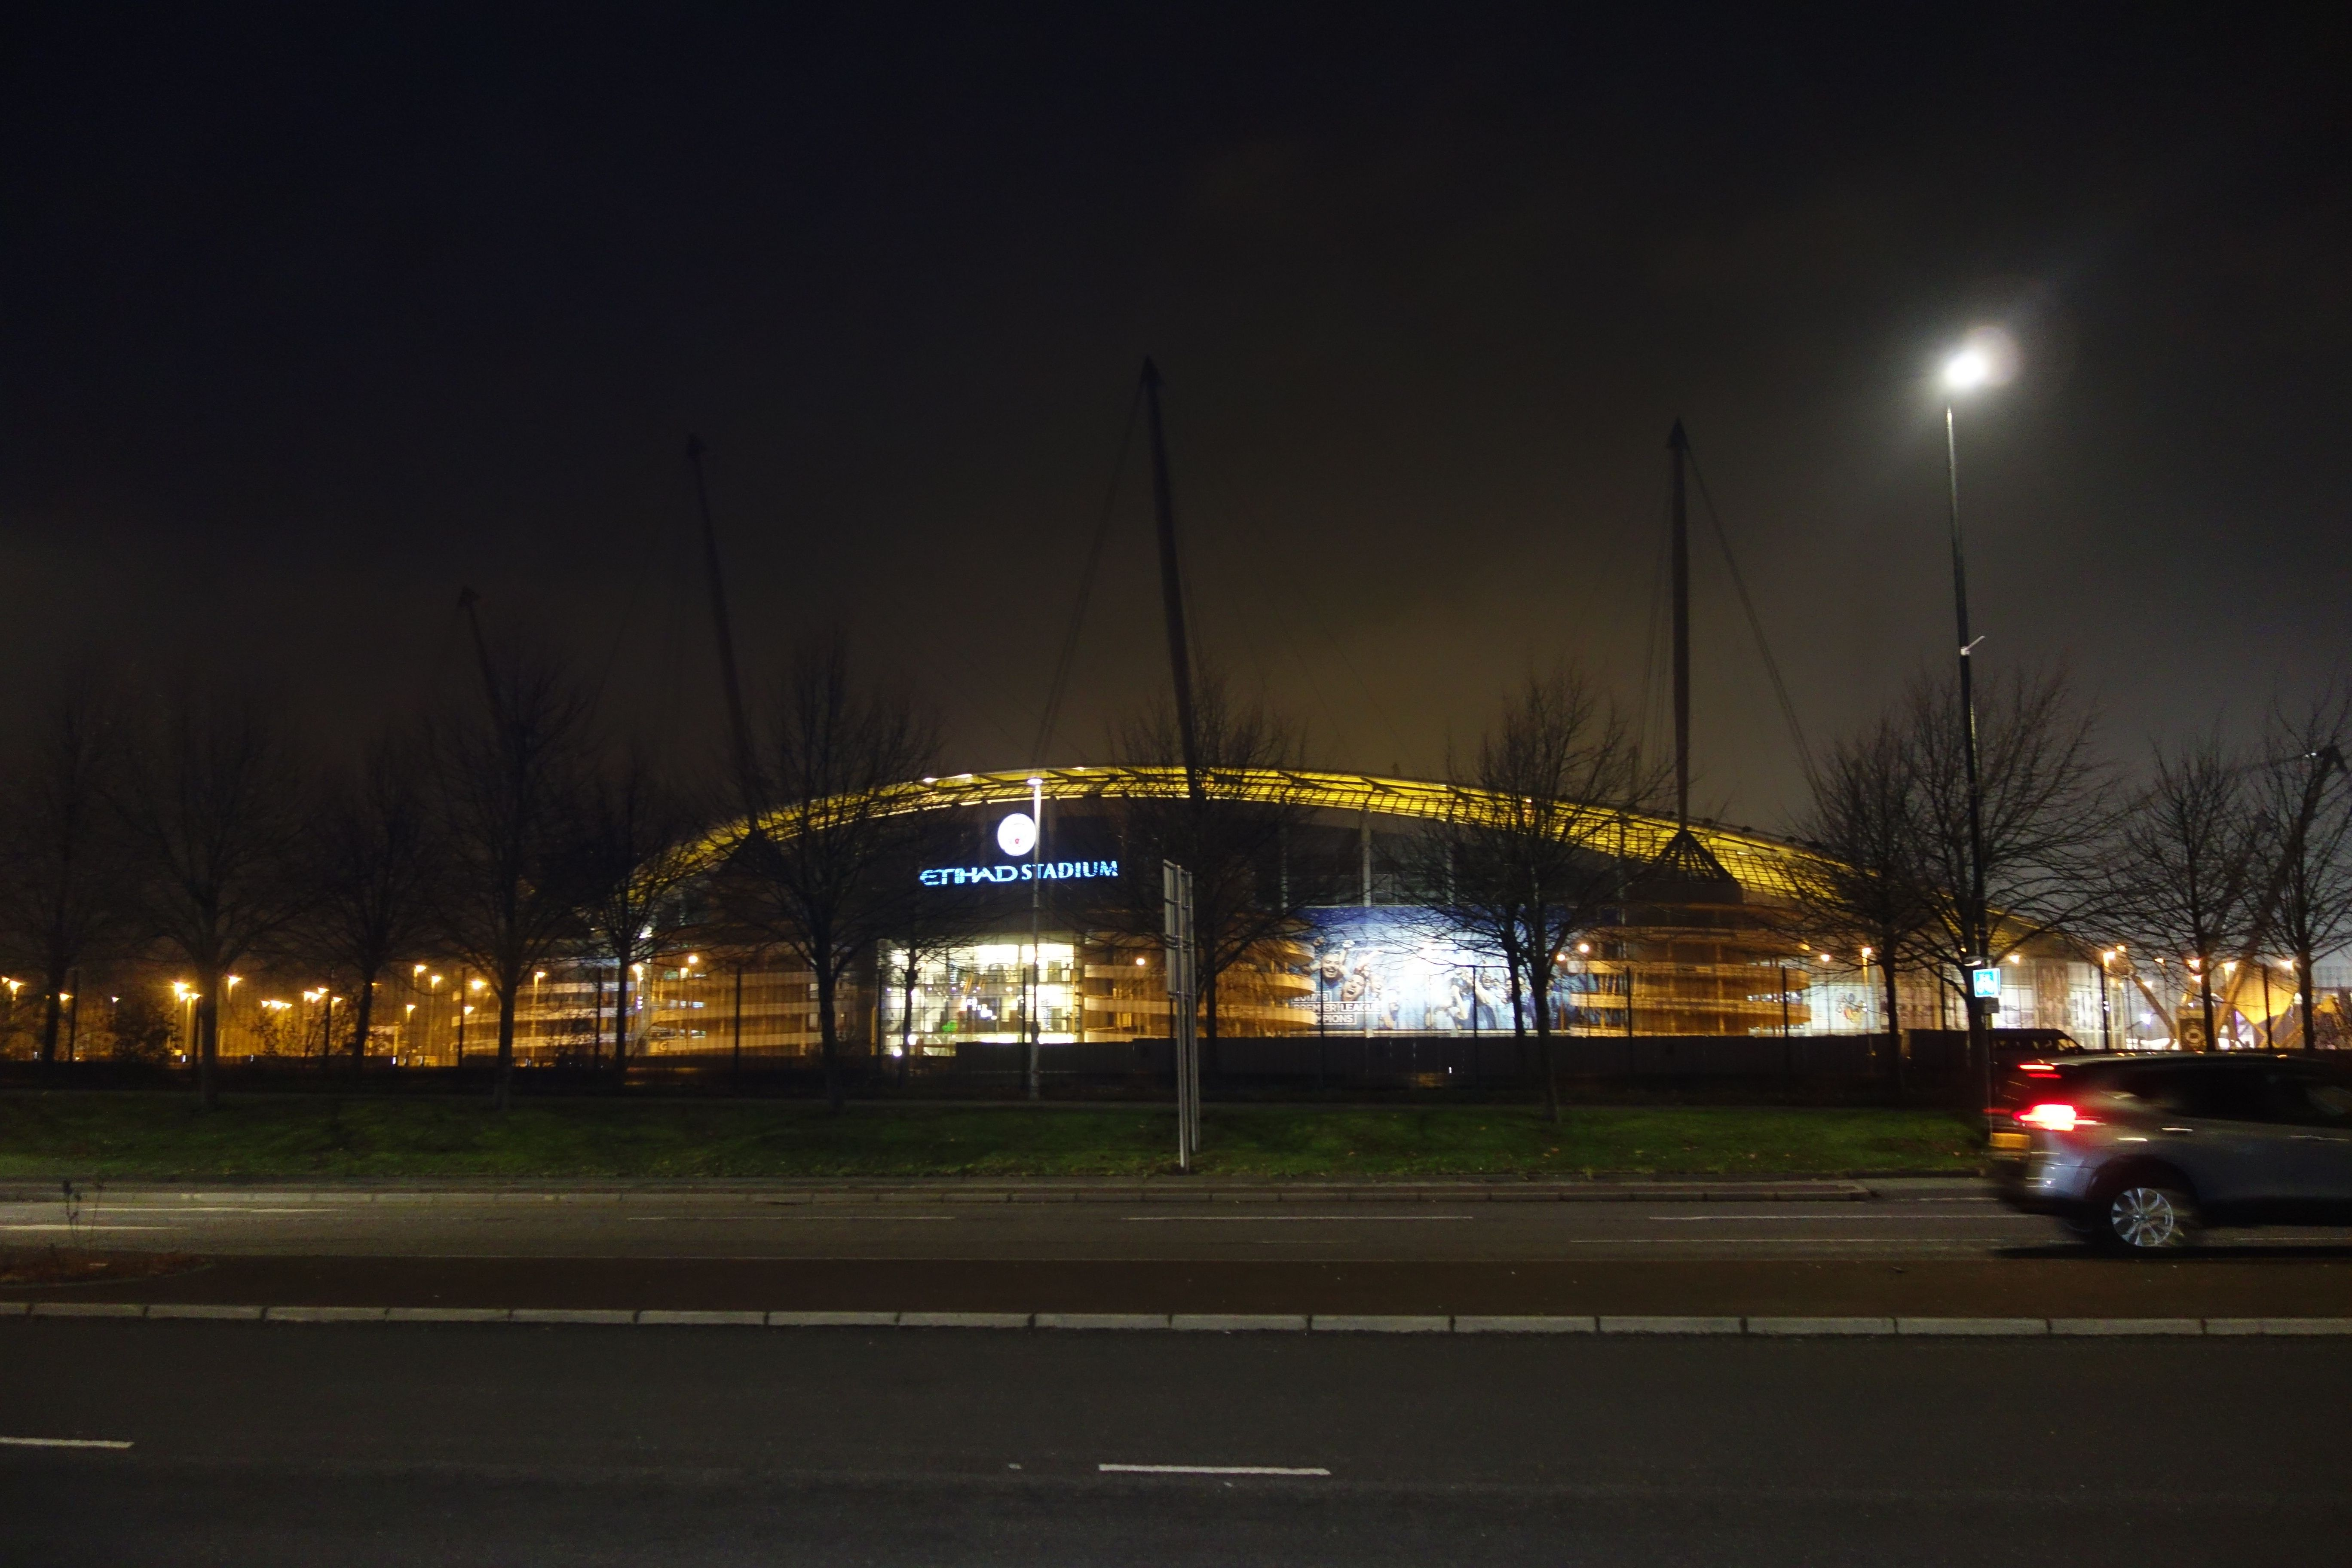 Etihead štadión